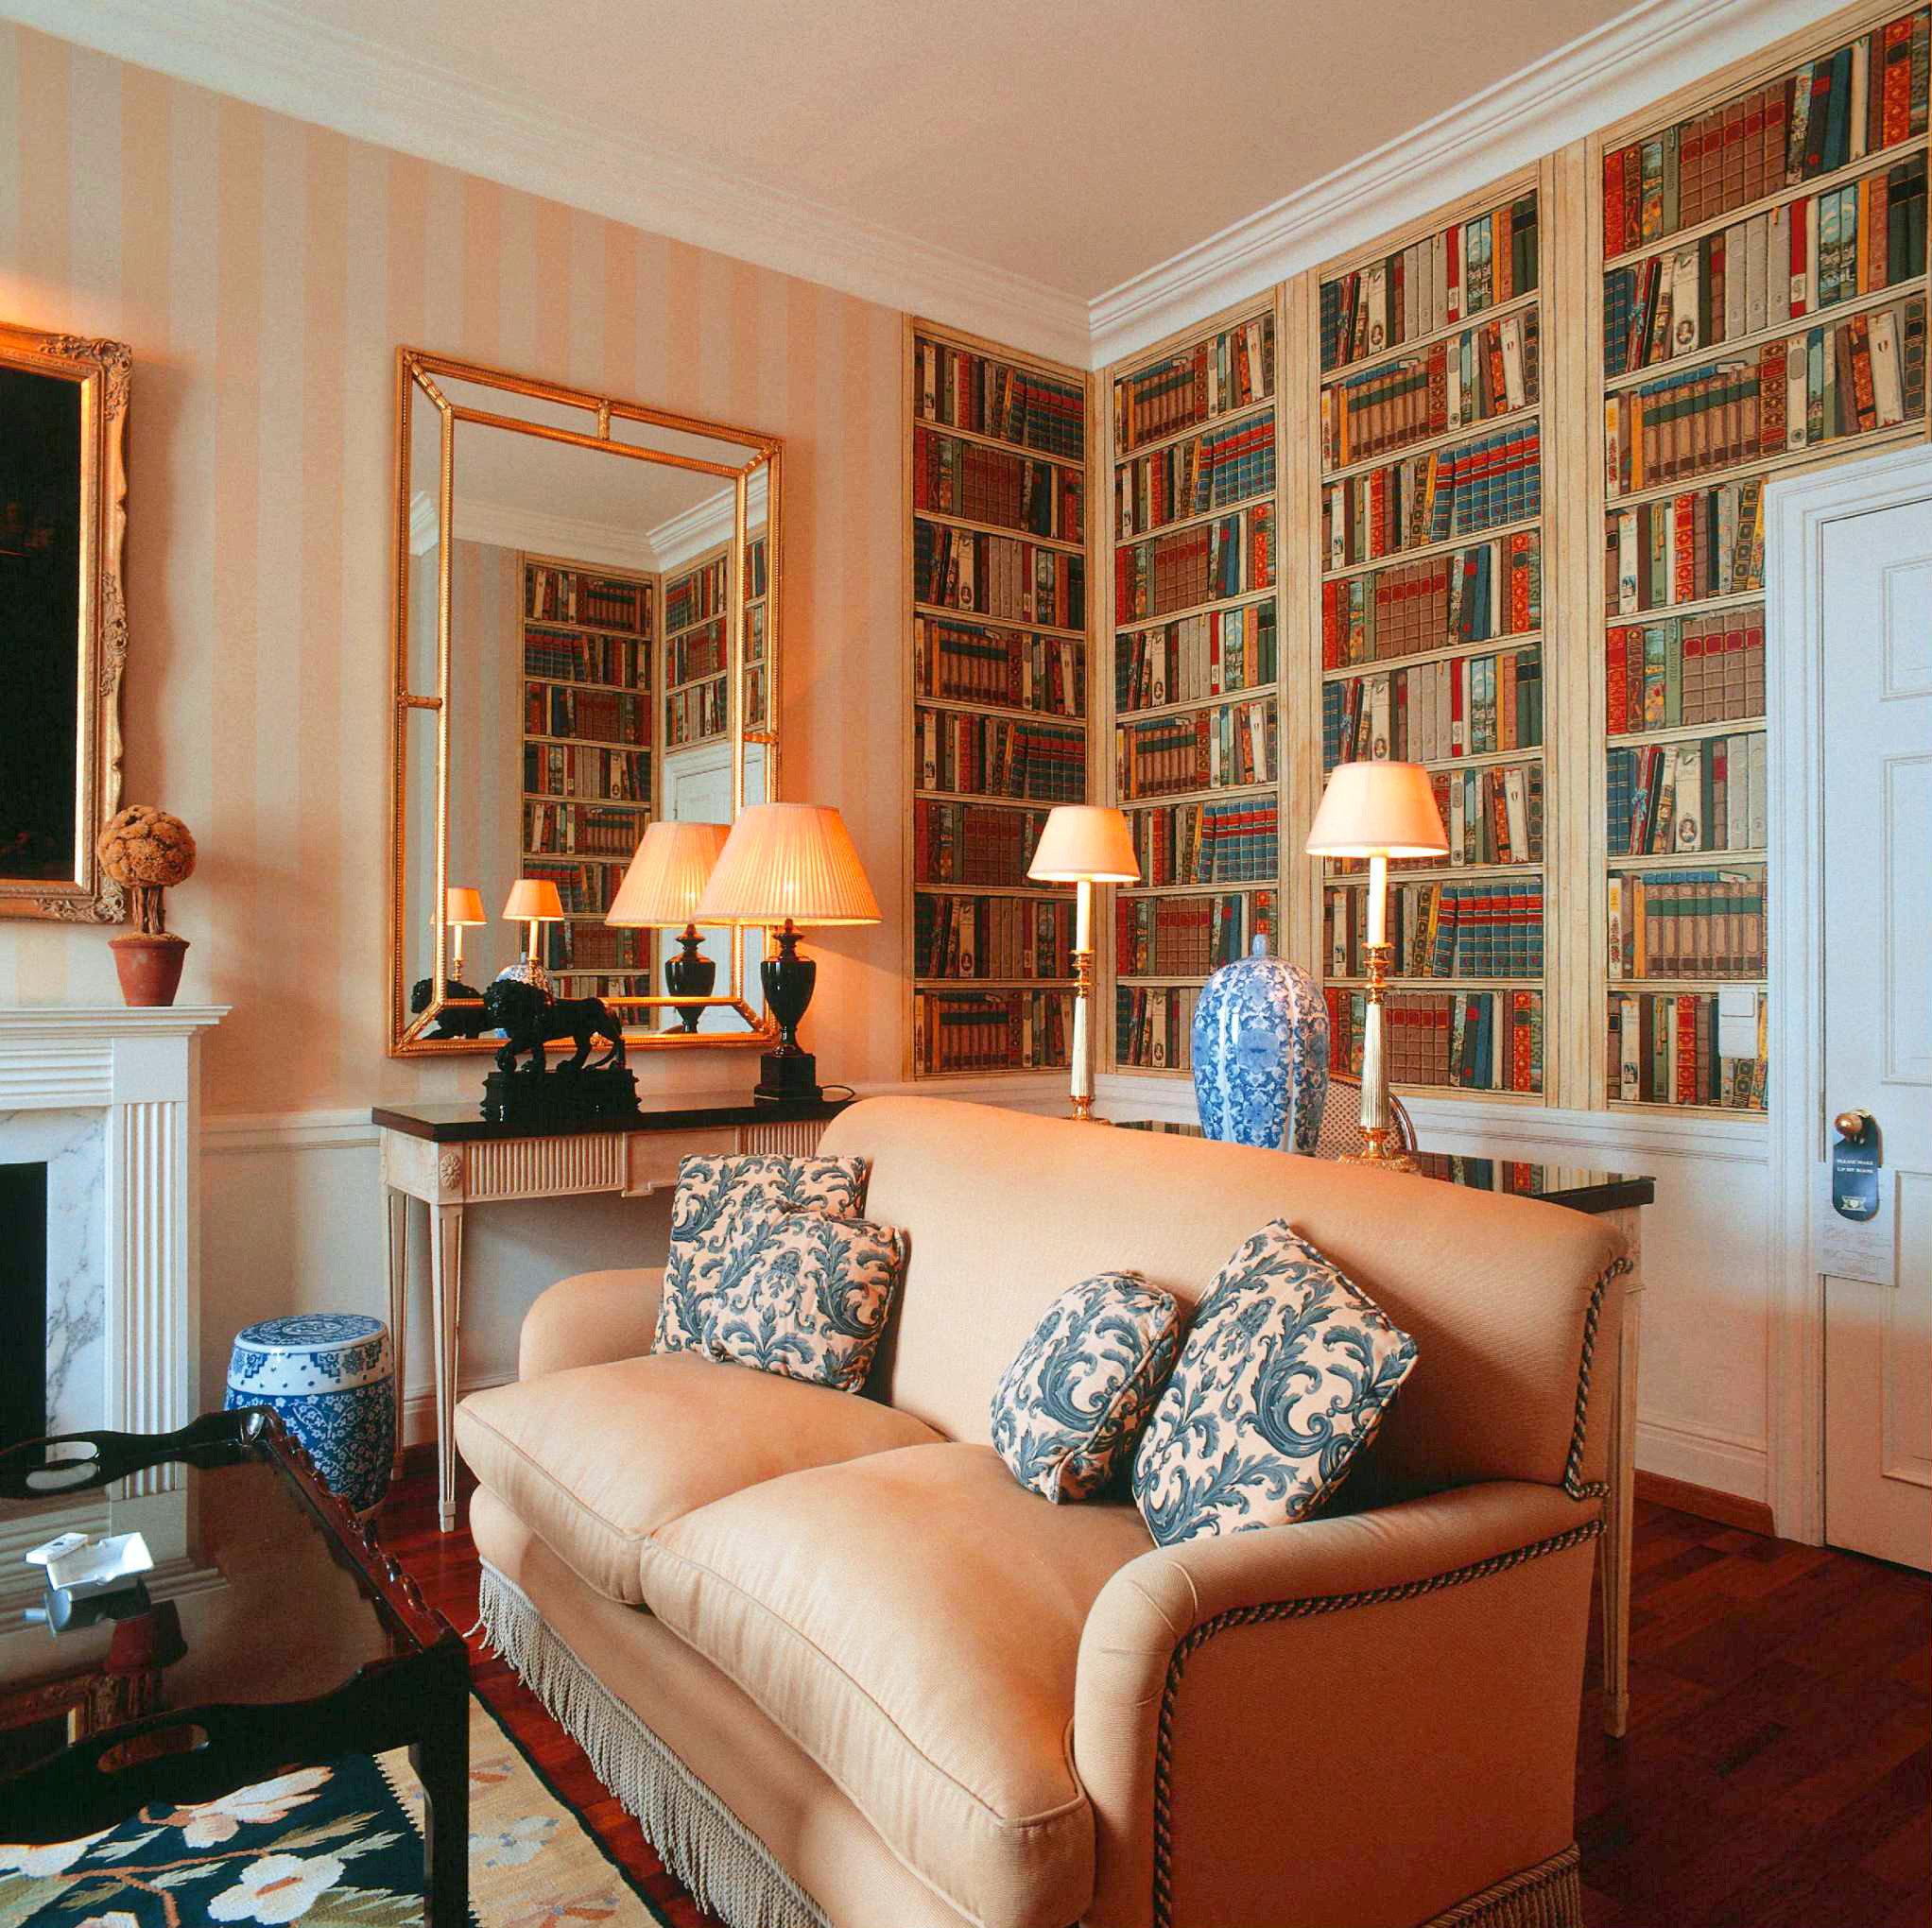 Lounge Luxury sofa living room property home hardwood Bedroom cottage